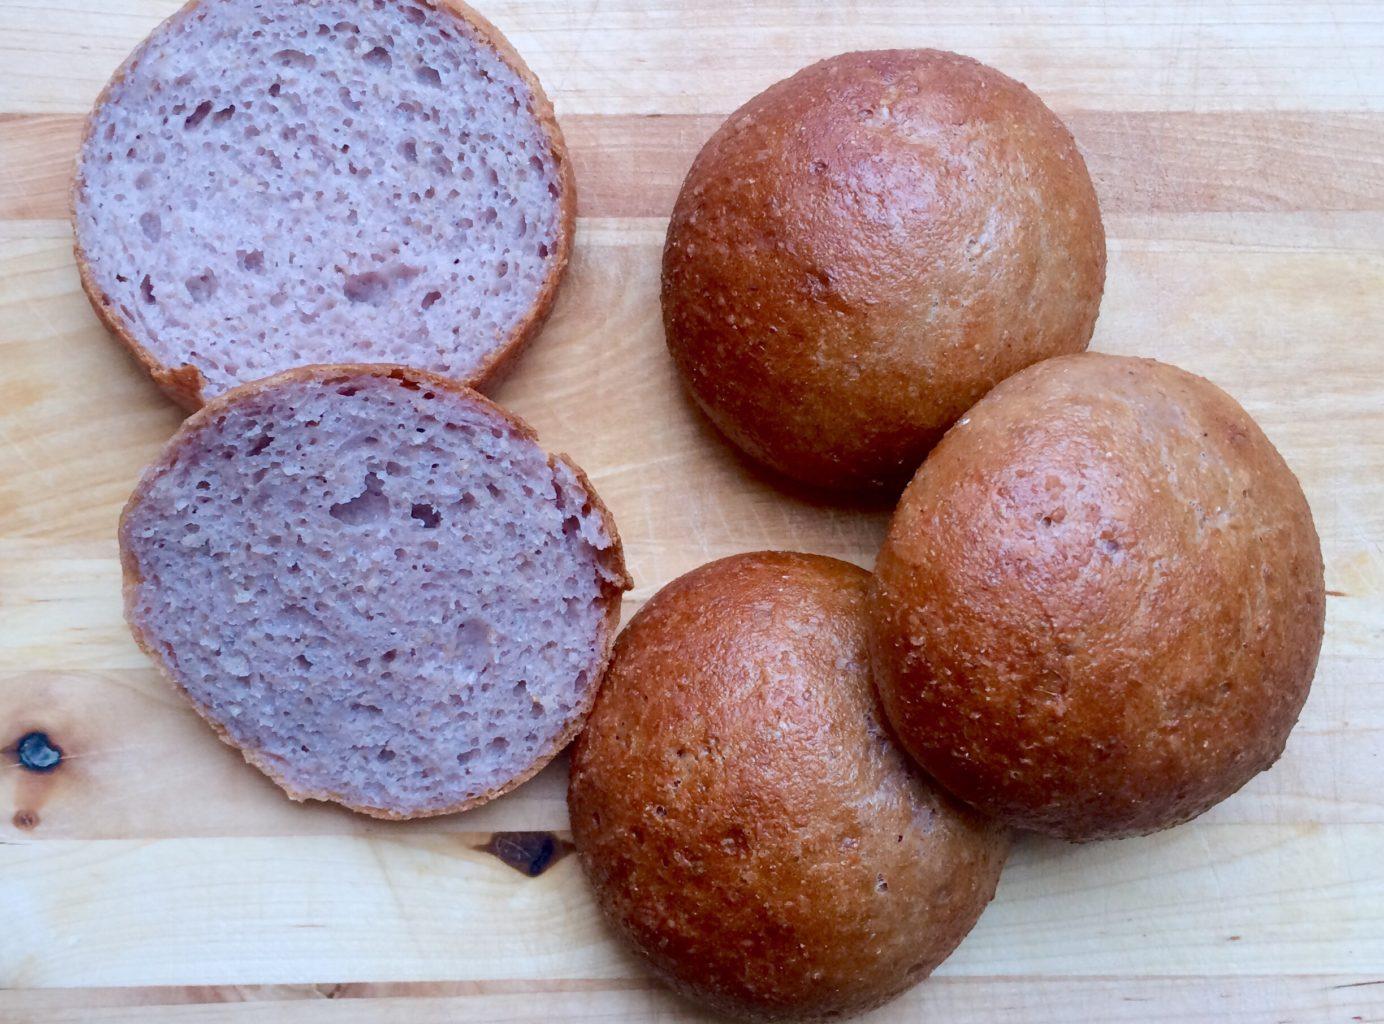 LavFODMAP glutenfrie og laktosefrie grove rundstykker